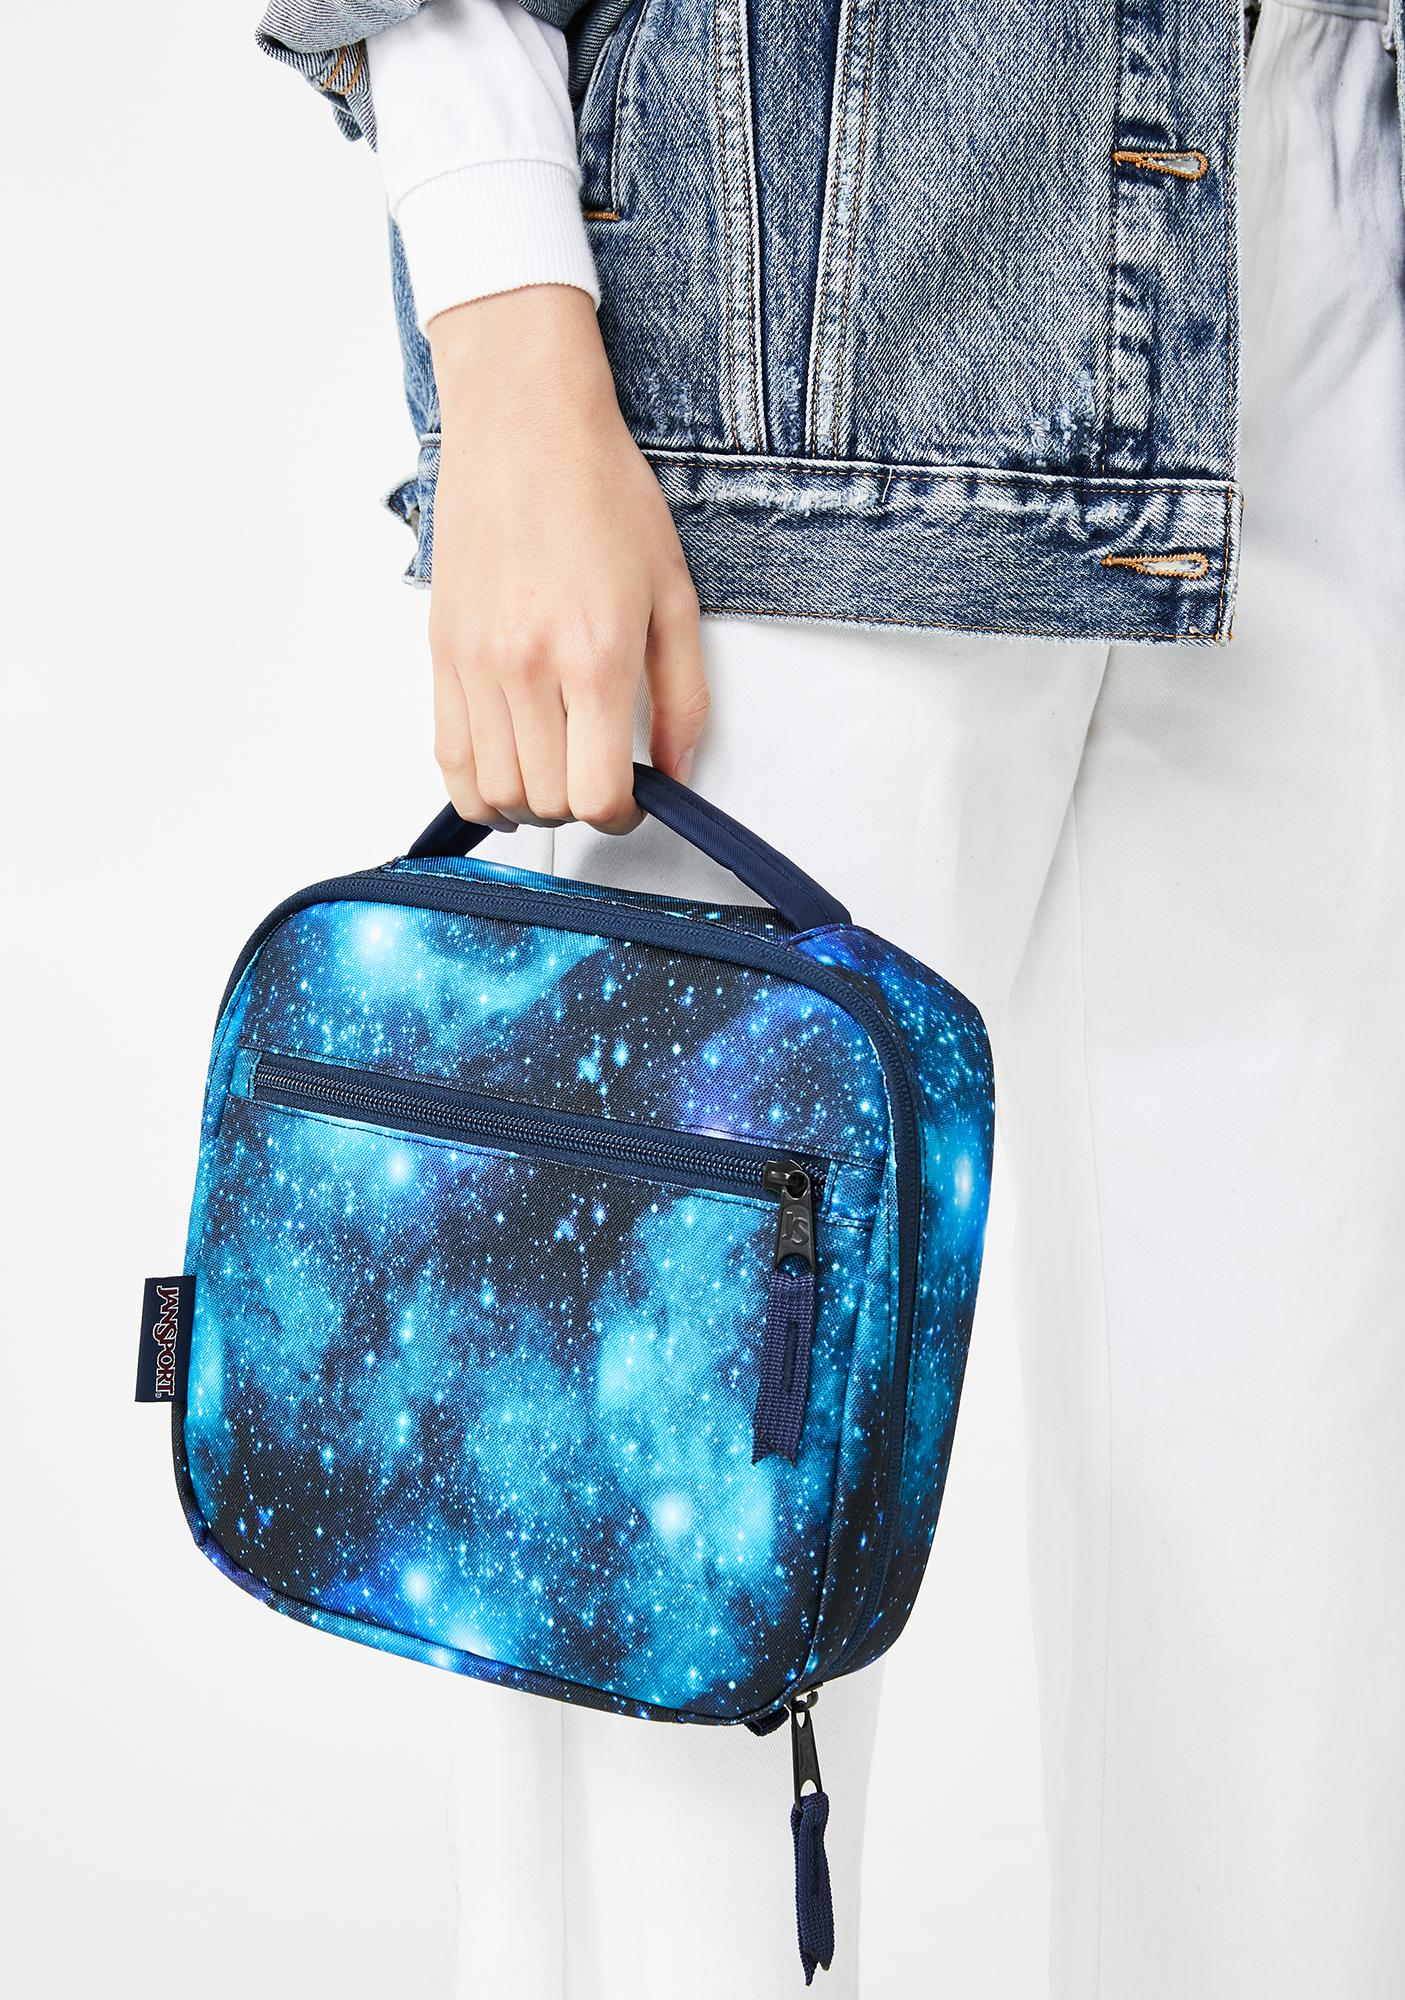 JanSport Galaxy Lunch Break Insulated Bag